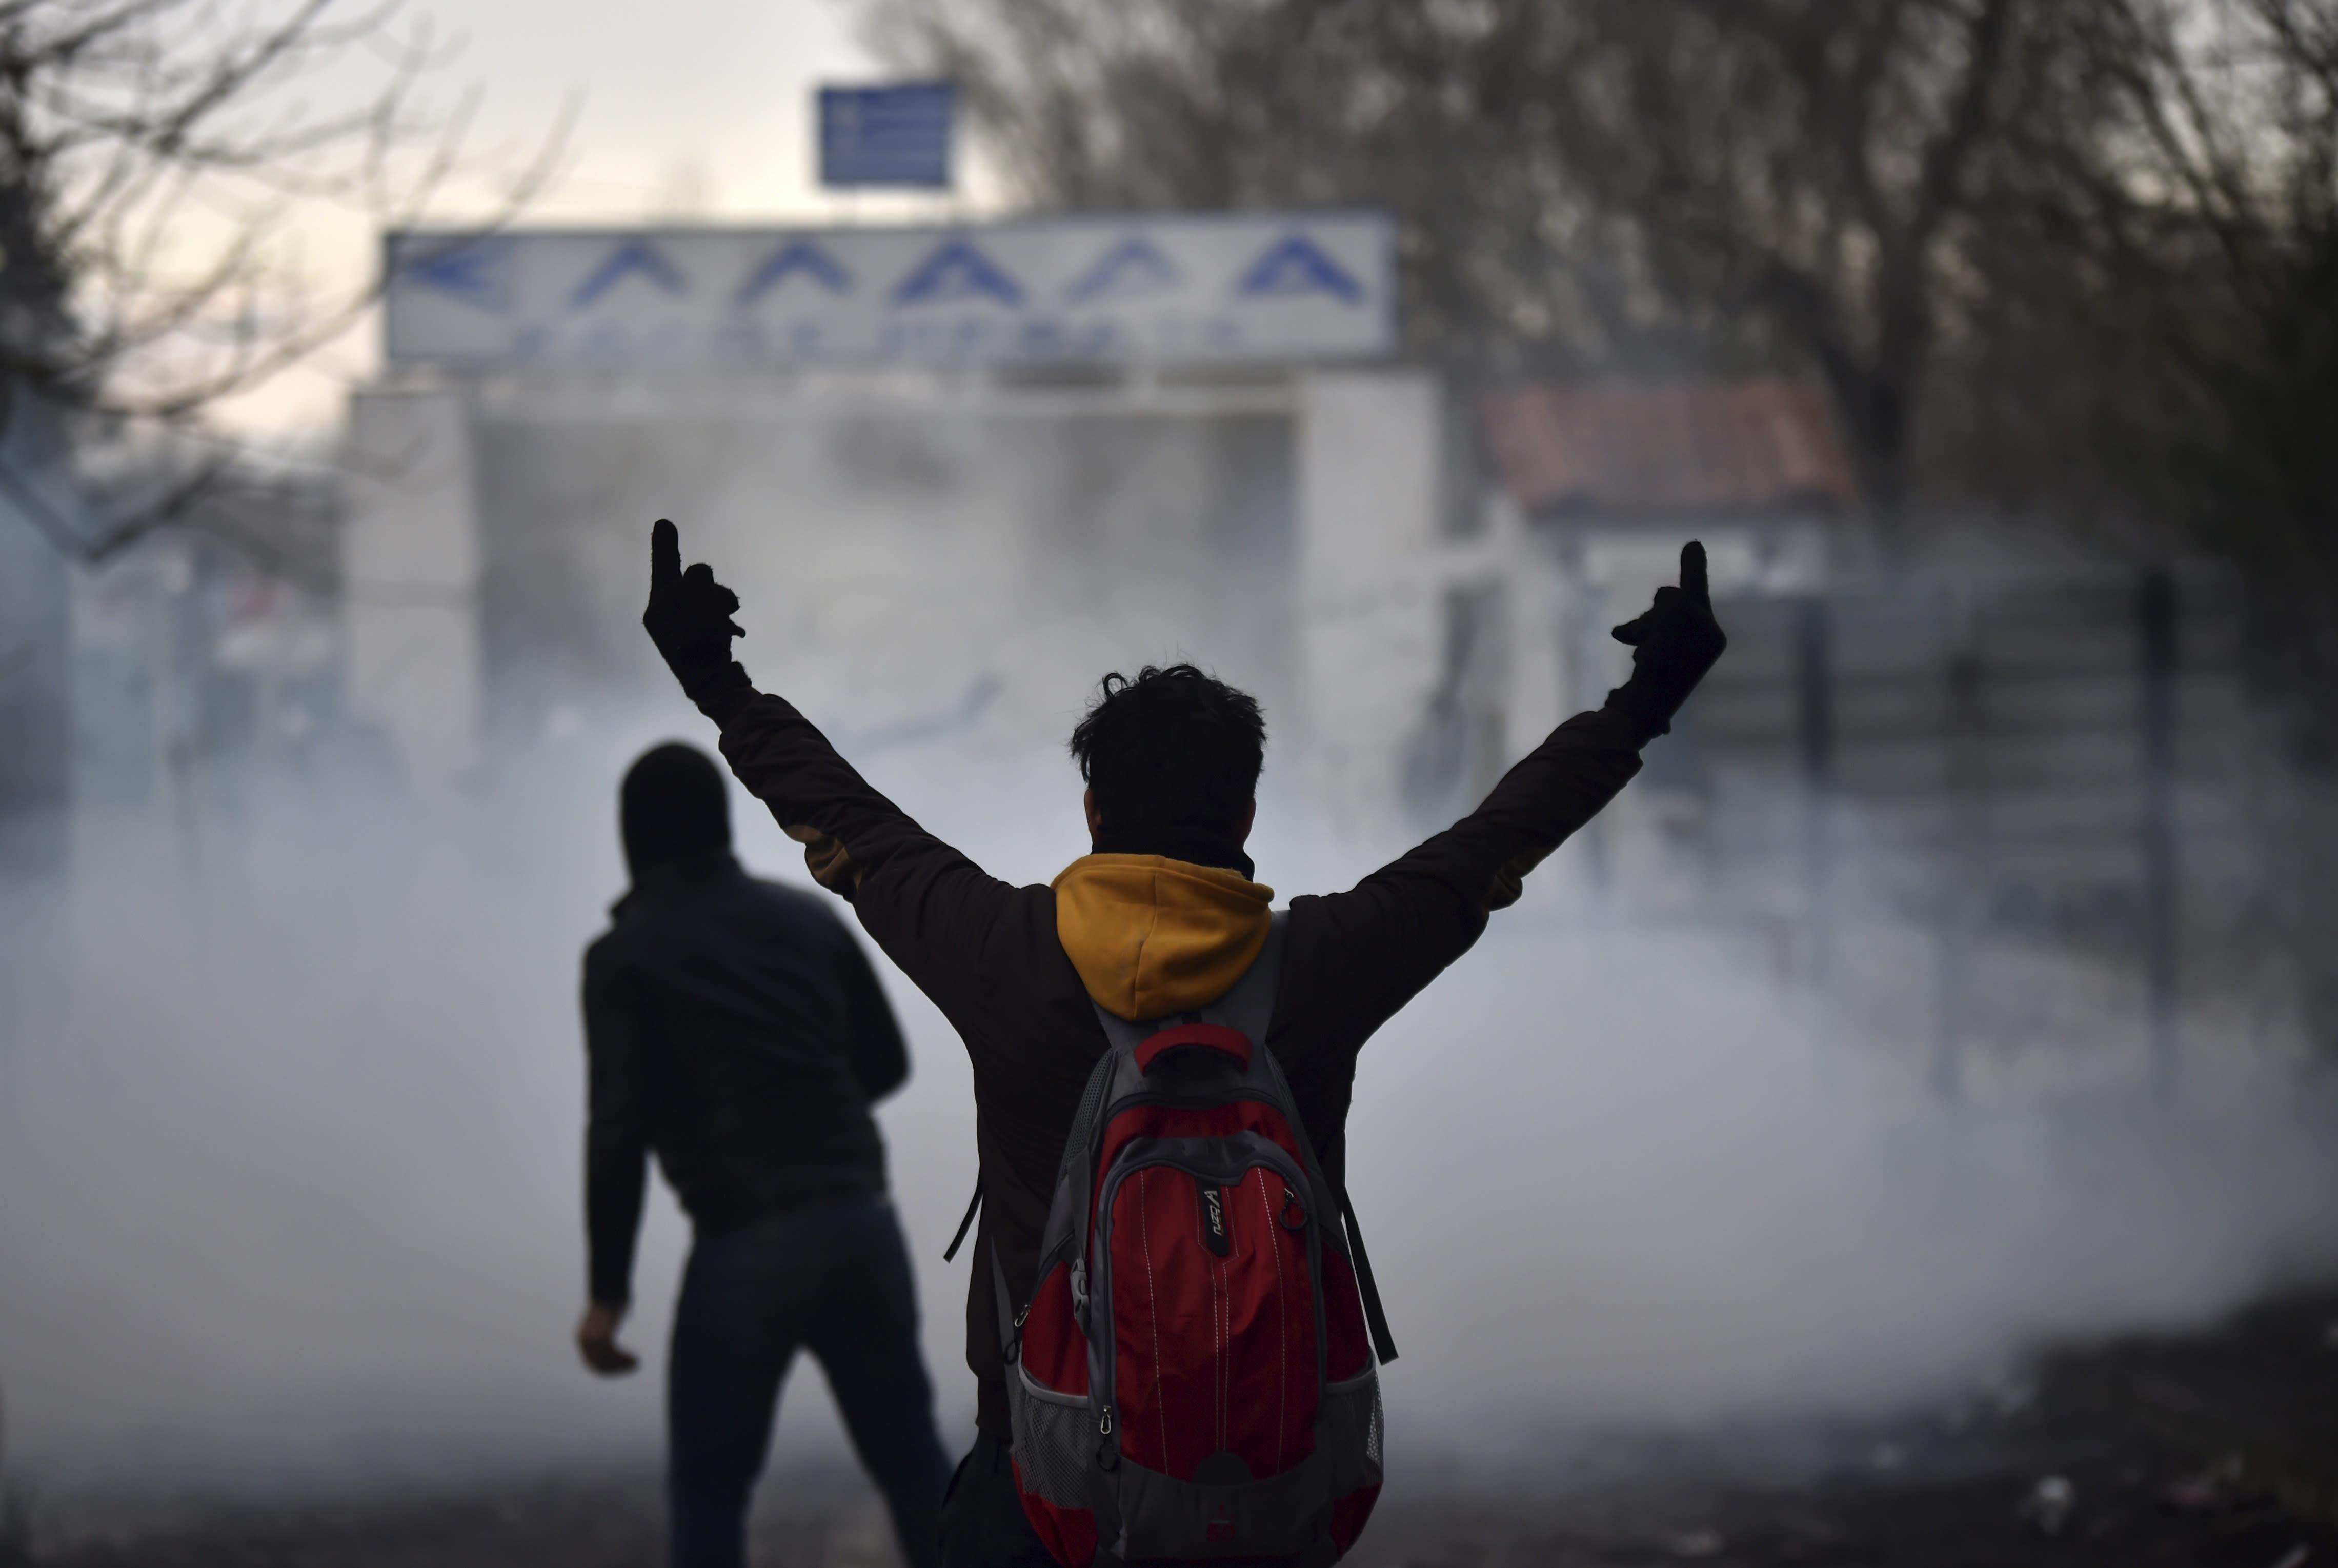 Greek border guard use teargas on migrants trying to enter Greece, at Pazarkule border gate, Edirne, Turkey, Saturday, Feb. 29, 2020. (Ismail Coskun/IHA via AP)